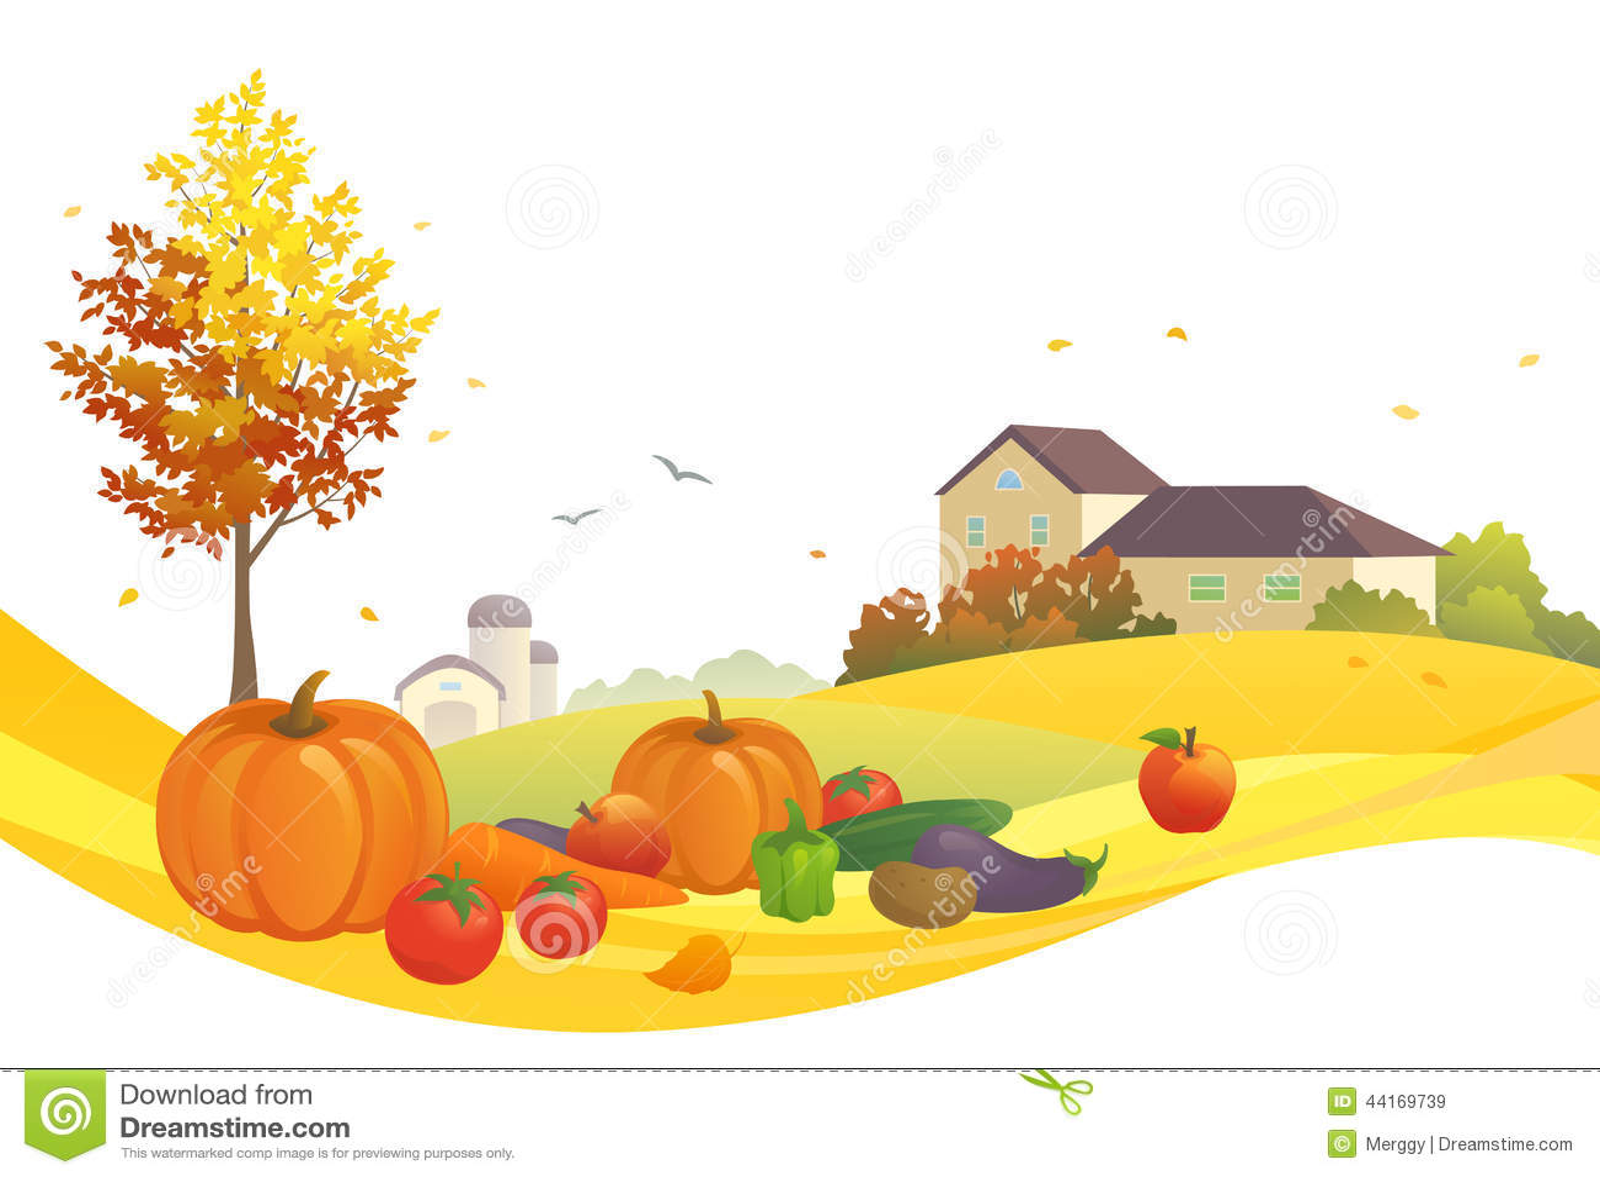 harvest design stock vector image 44169739 fall season clip art free disney fall season clipart